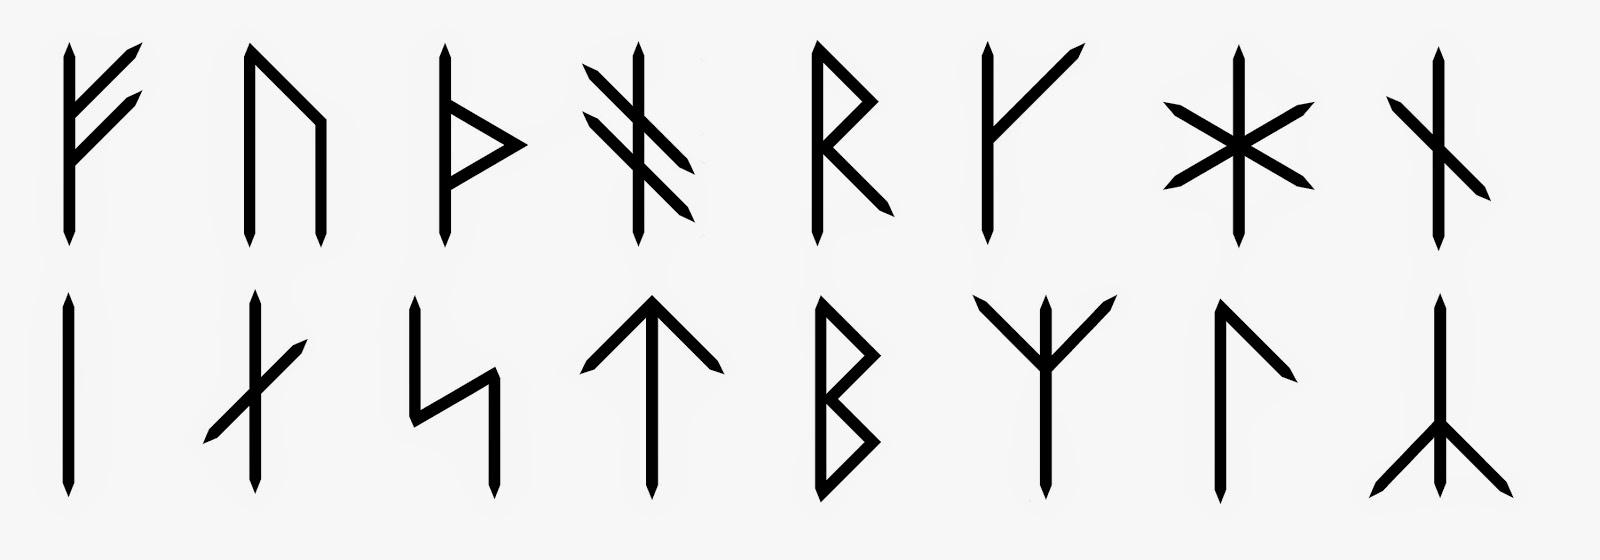 Real Rune Magick The Armanen Runes In Historical Context